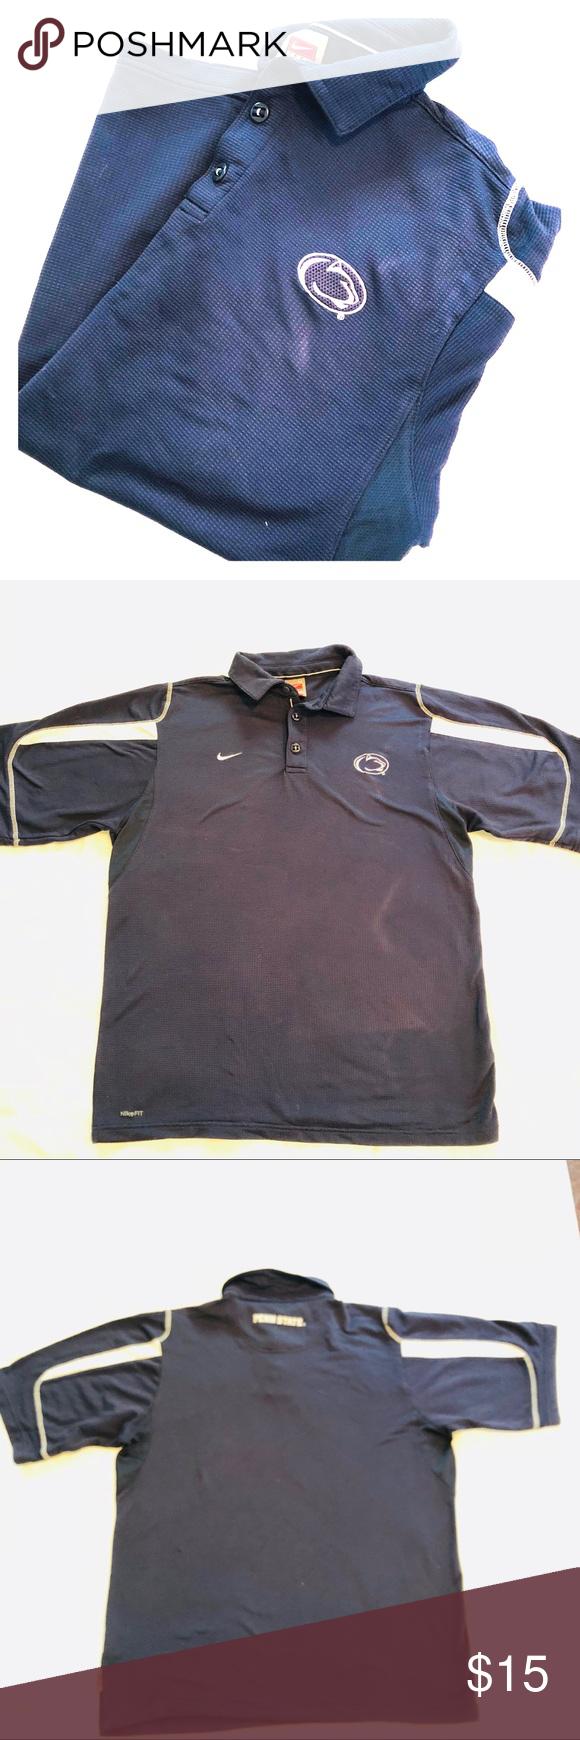 Penn State Mens Logo Nike Collared Shirt Blue Polo In 2018 My Posh